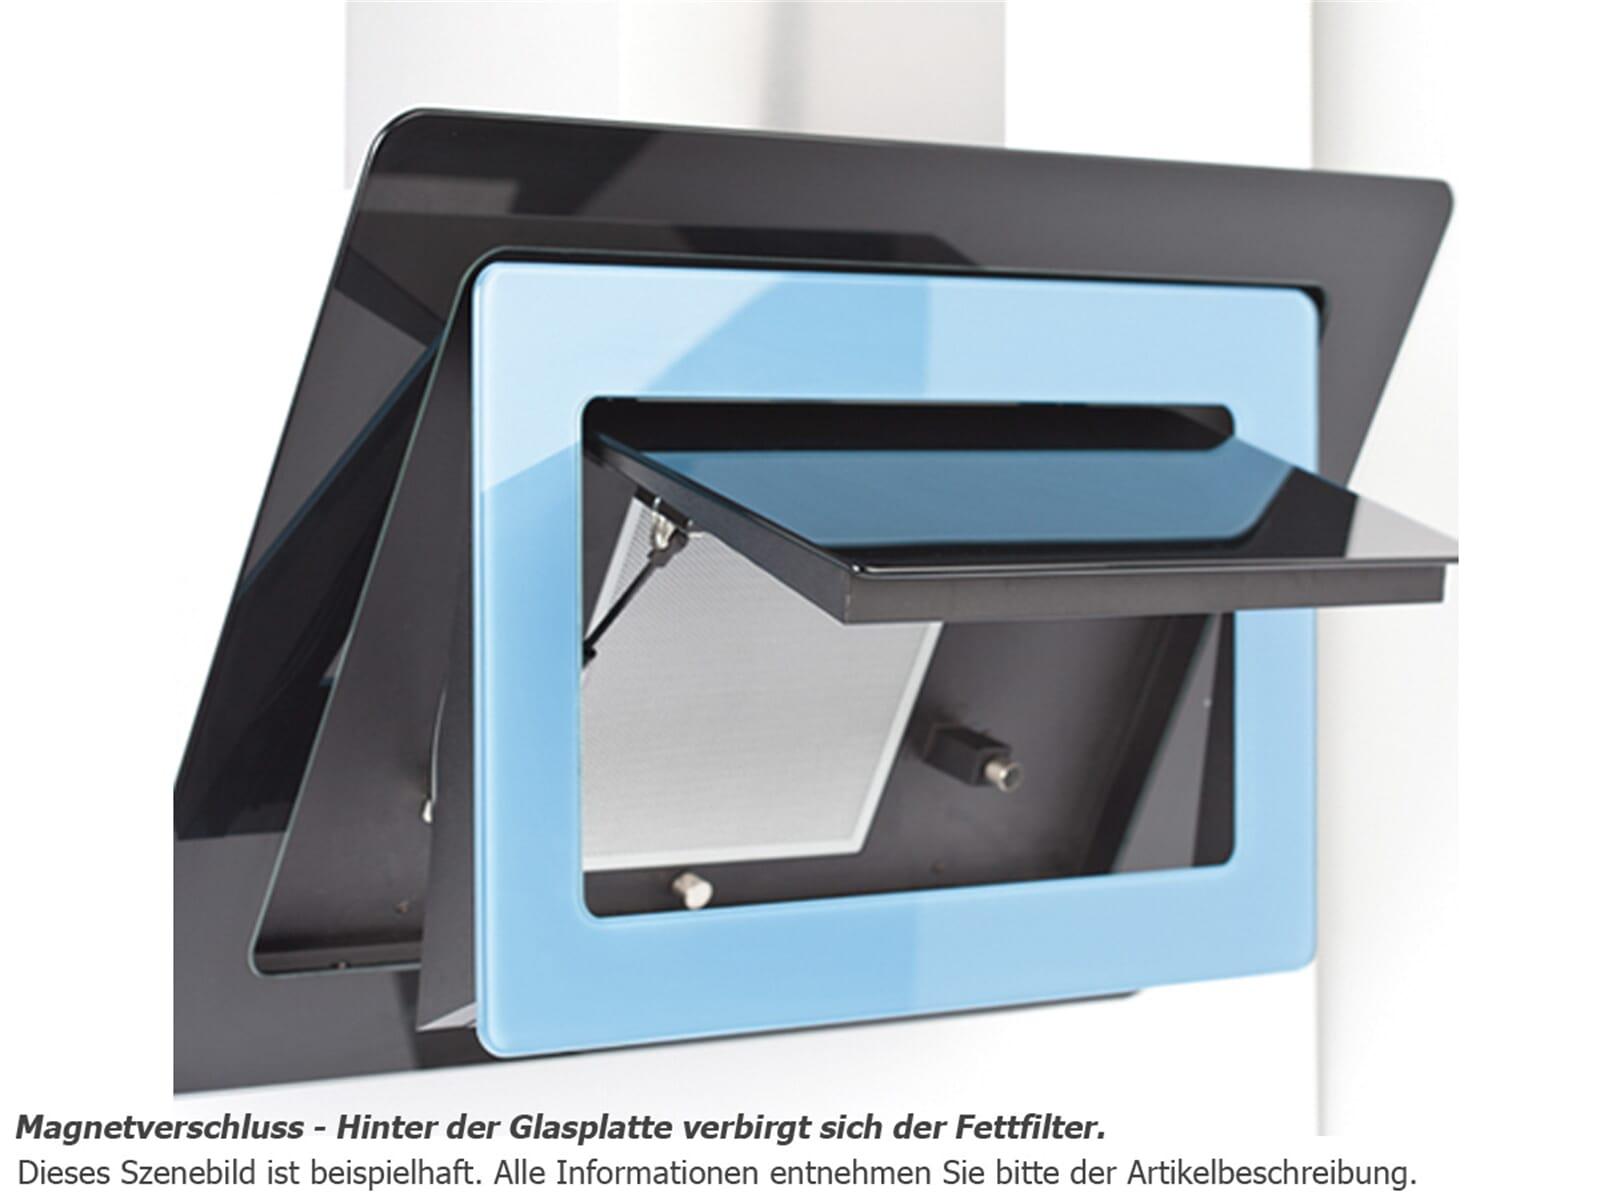 silverline dunstabzugshaube erfahrung induktionskochfeld. Black Bedroom Furniture Sets. Home Design Ideas